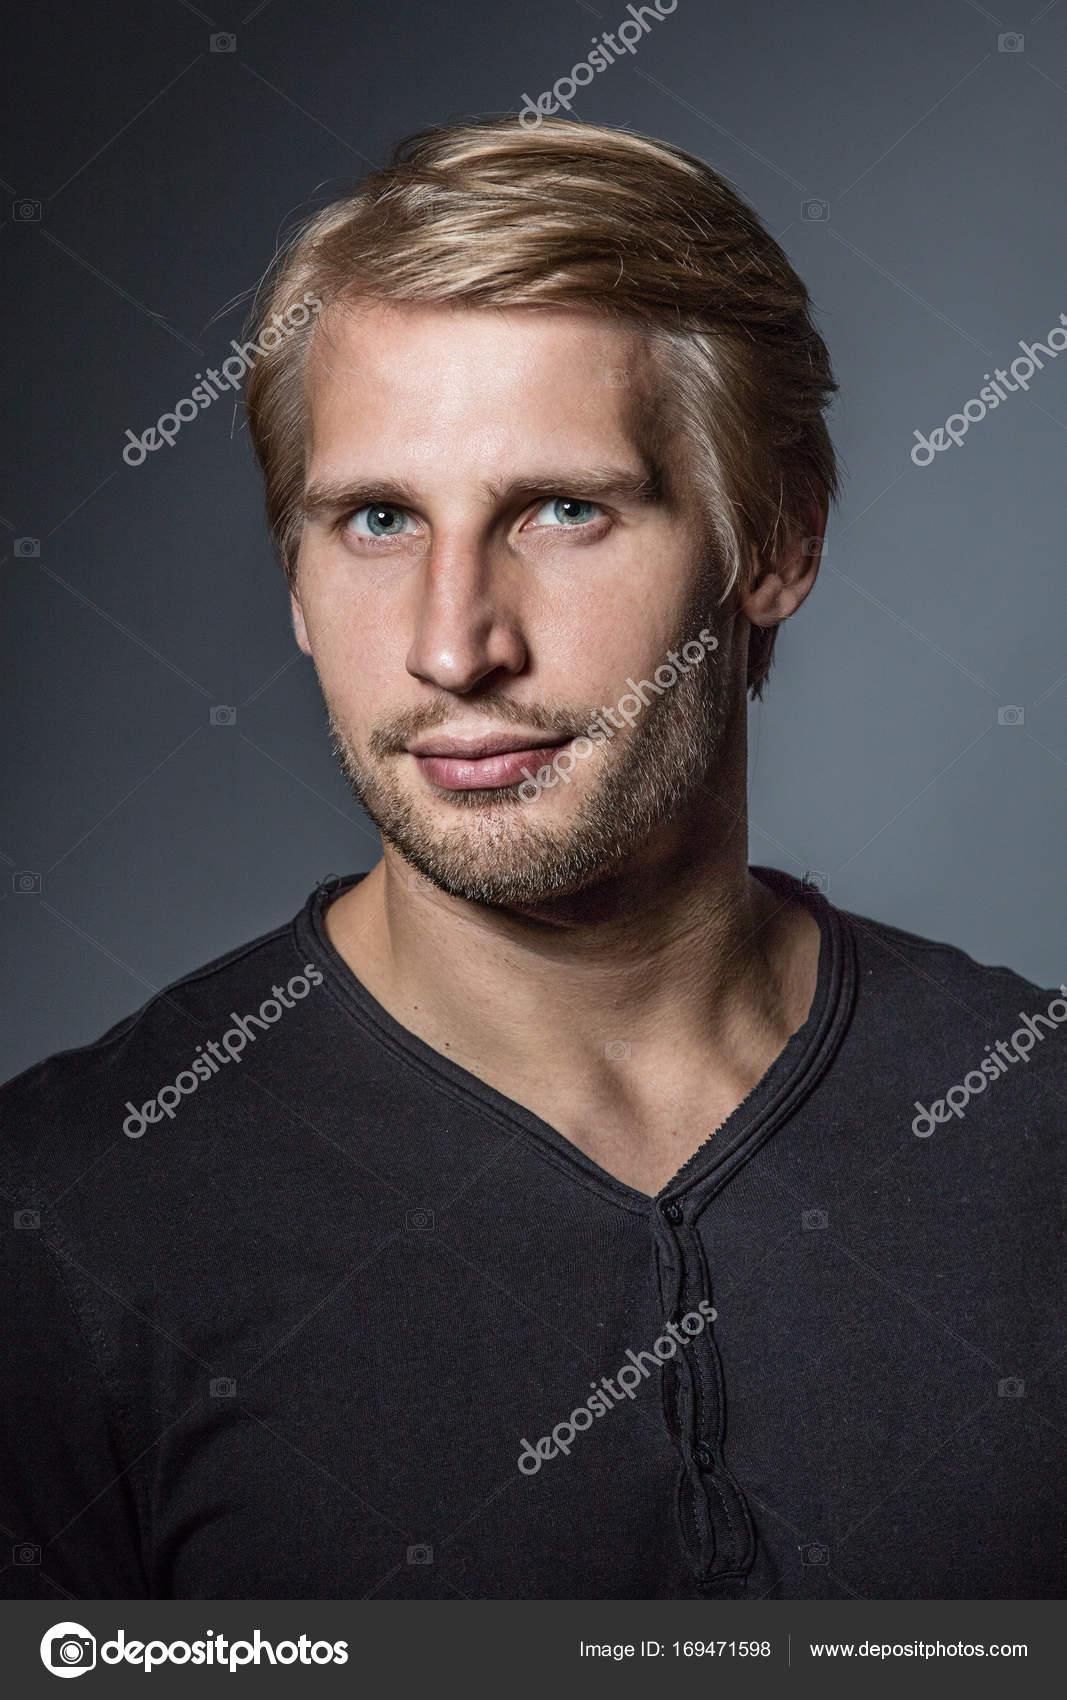 Muscular blonde guy